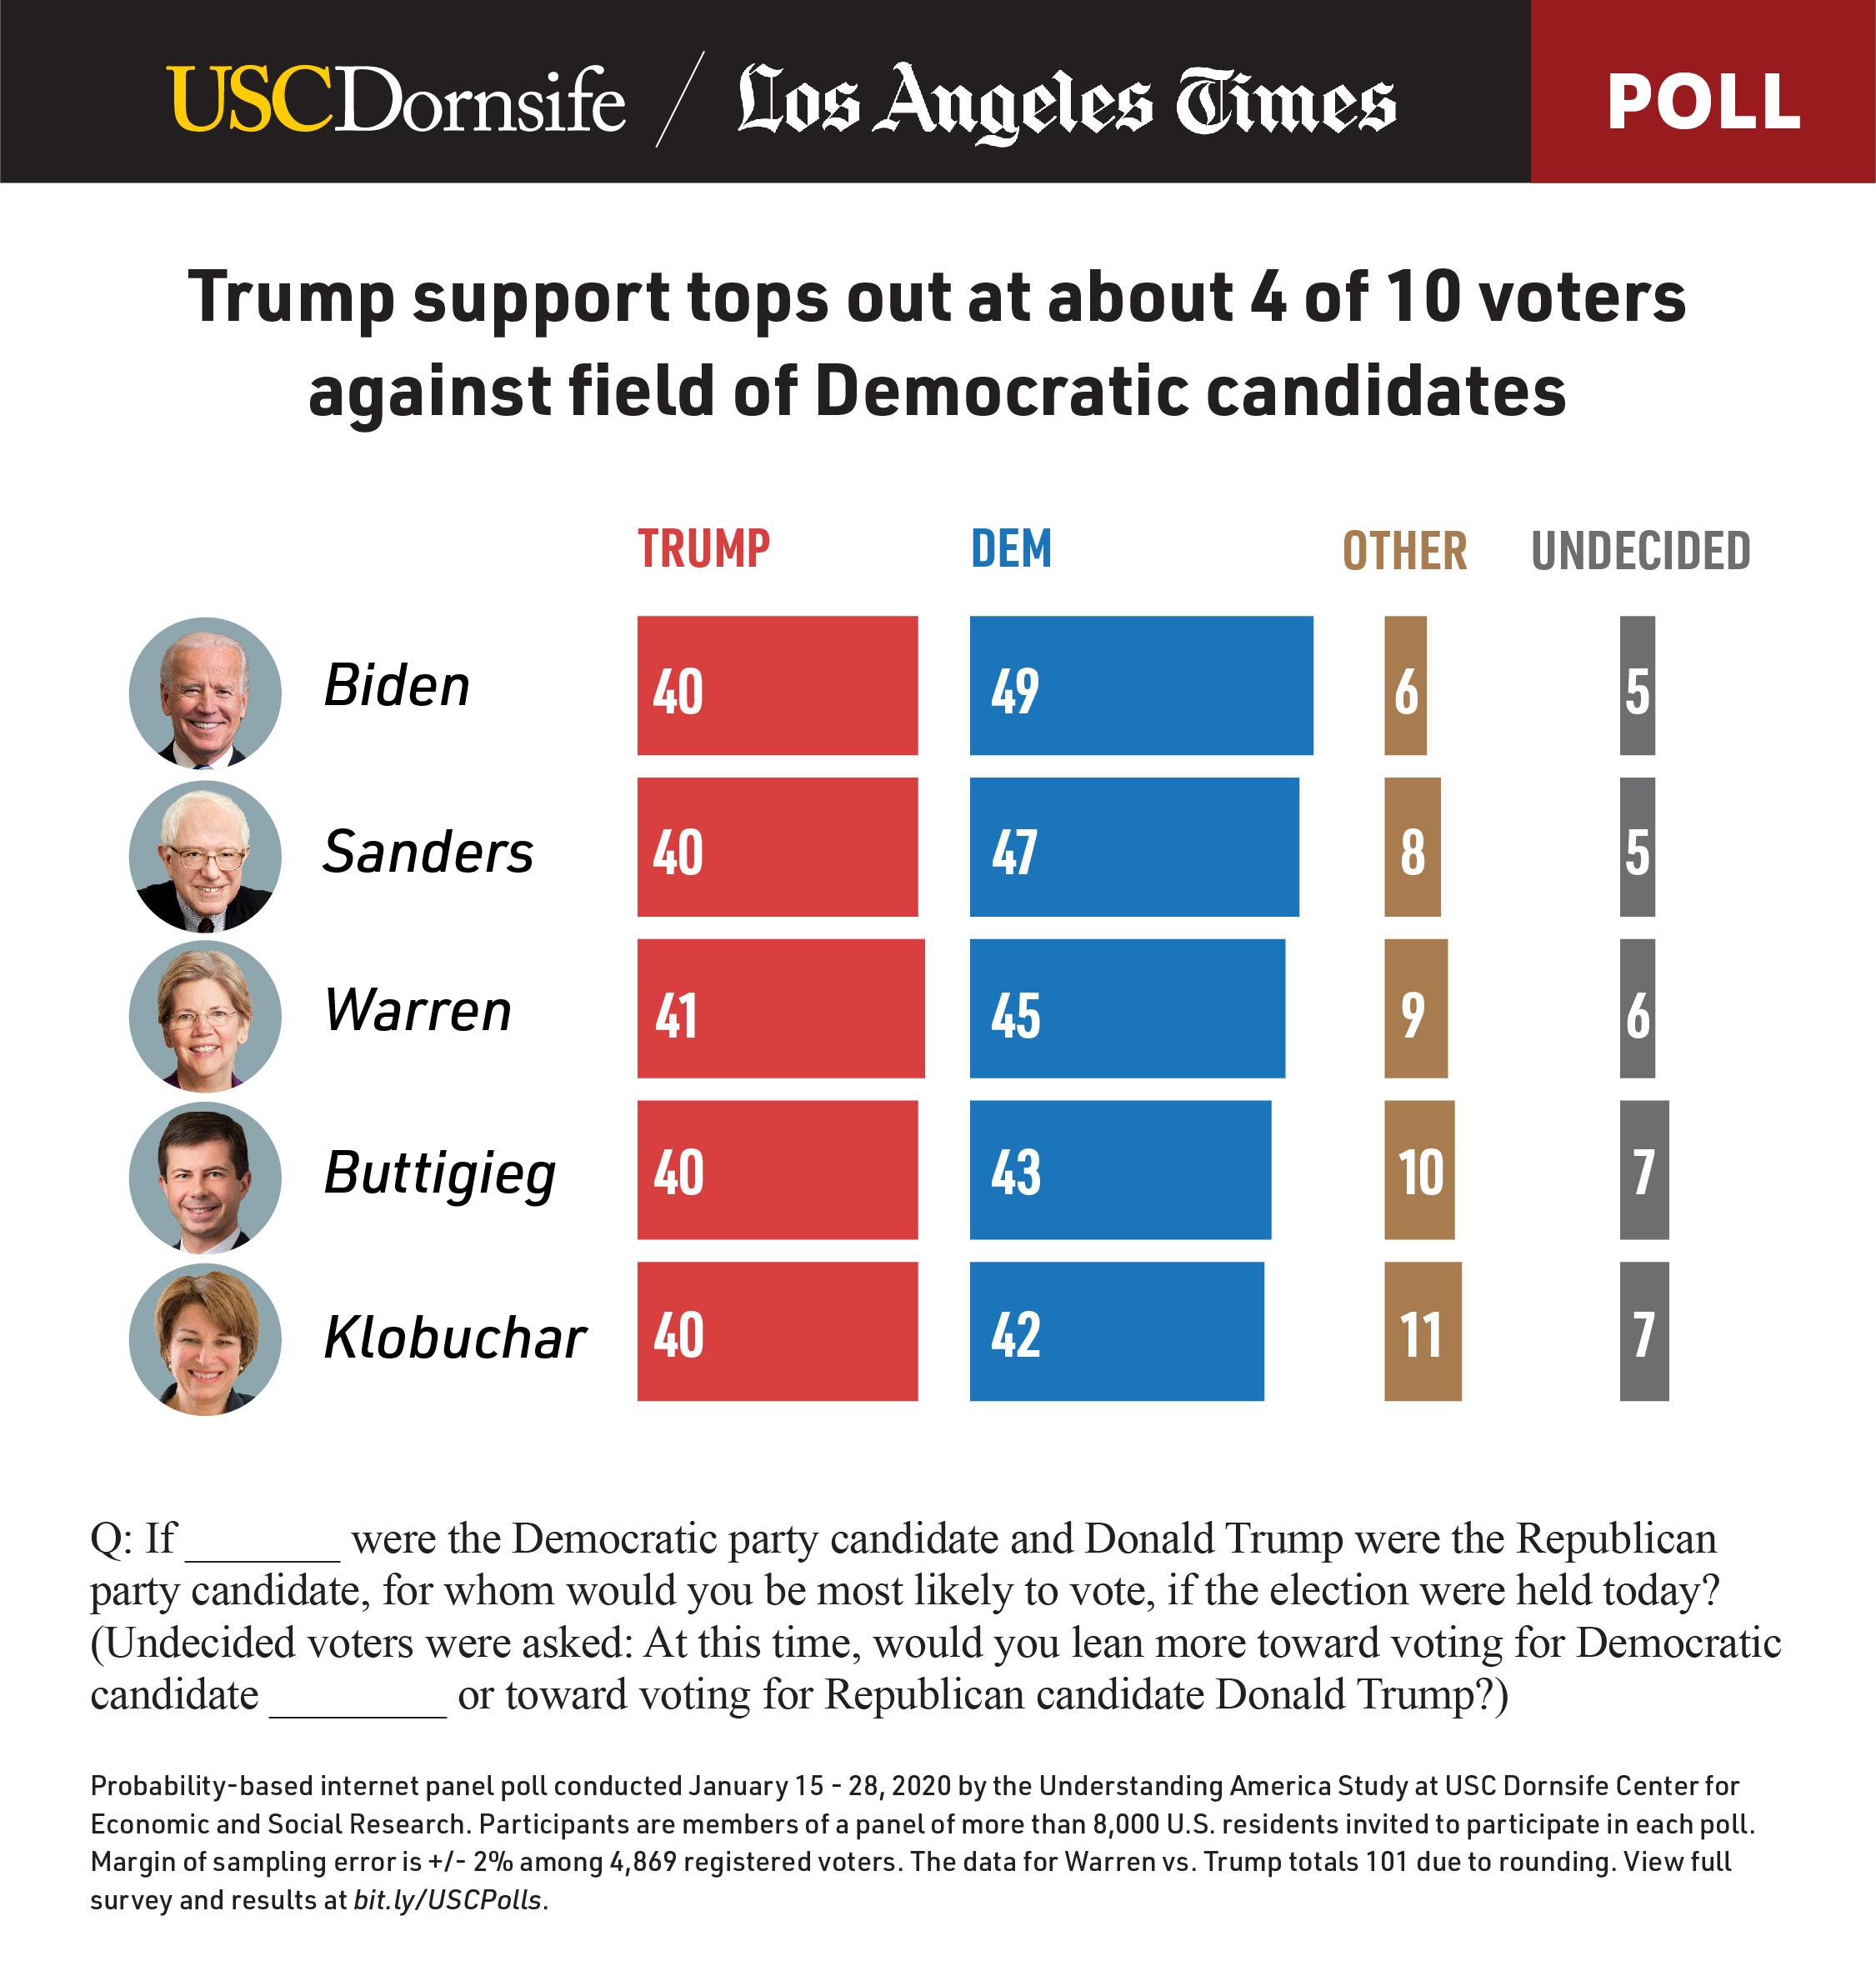 LAT dornsife elections poll